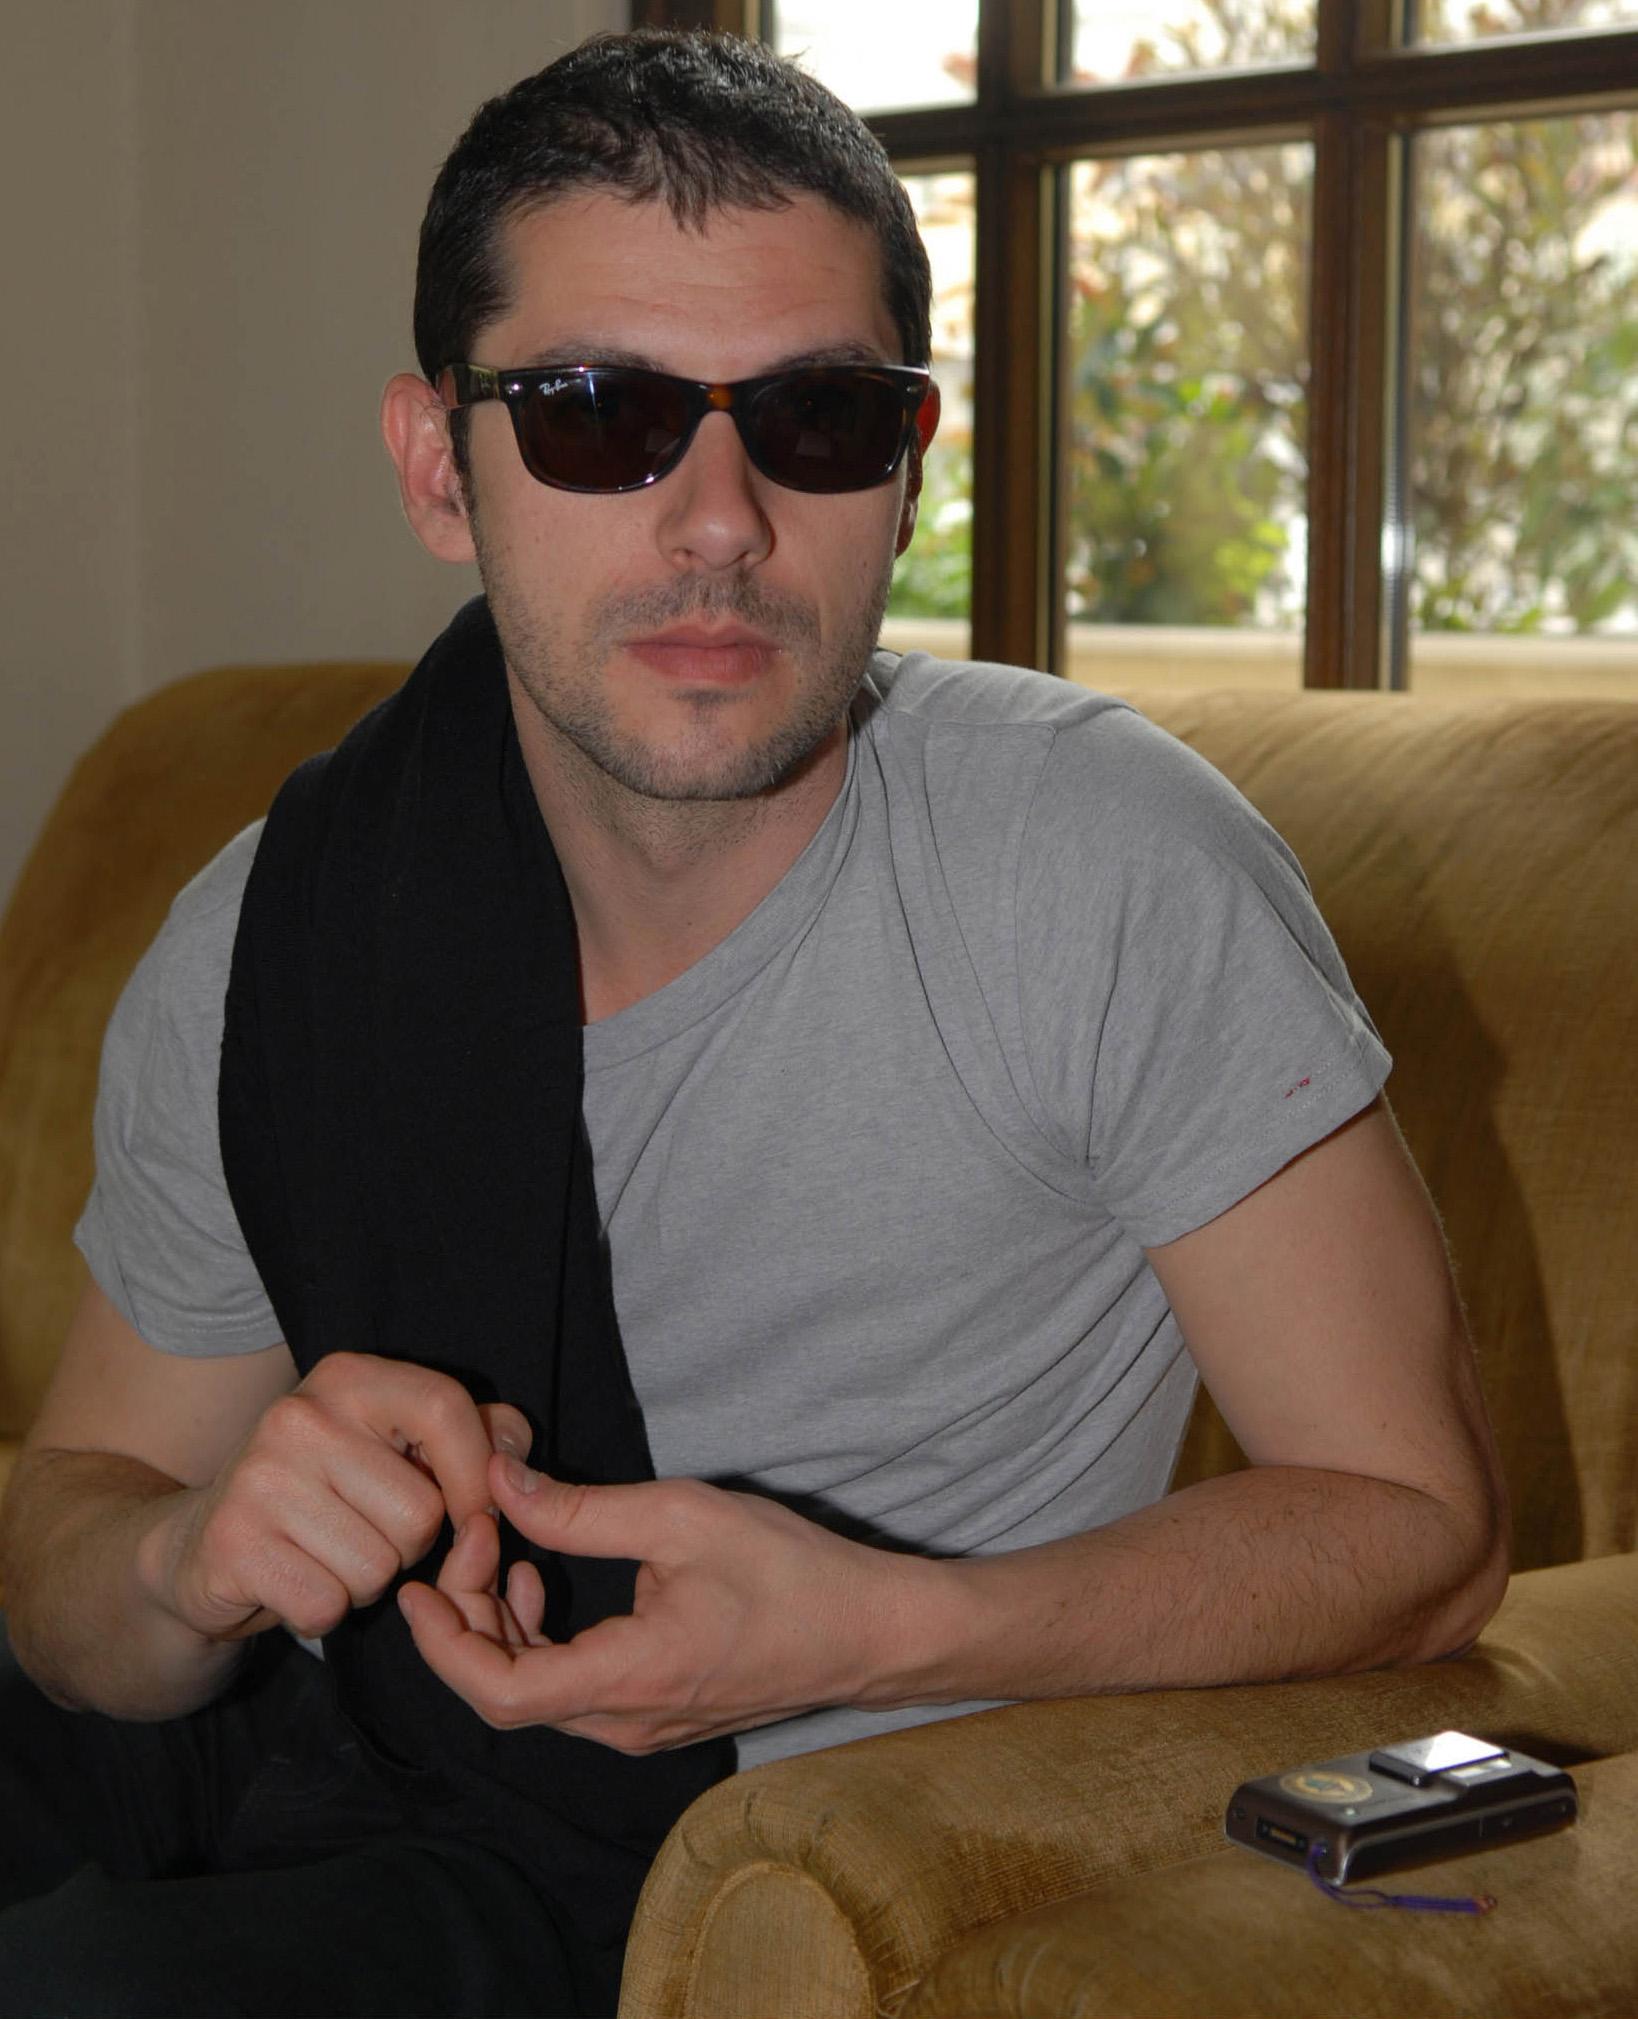 Melvil Poupaud à Athènes en avril 2008. Photo d'Helen Grigoriadou.